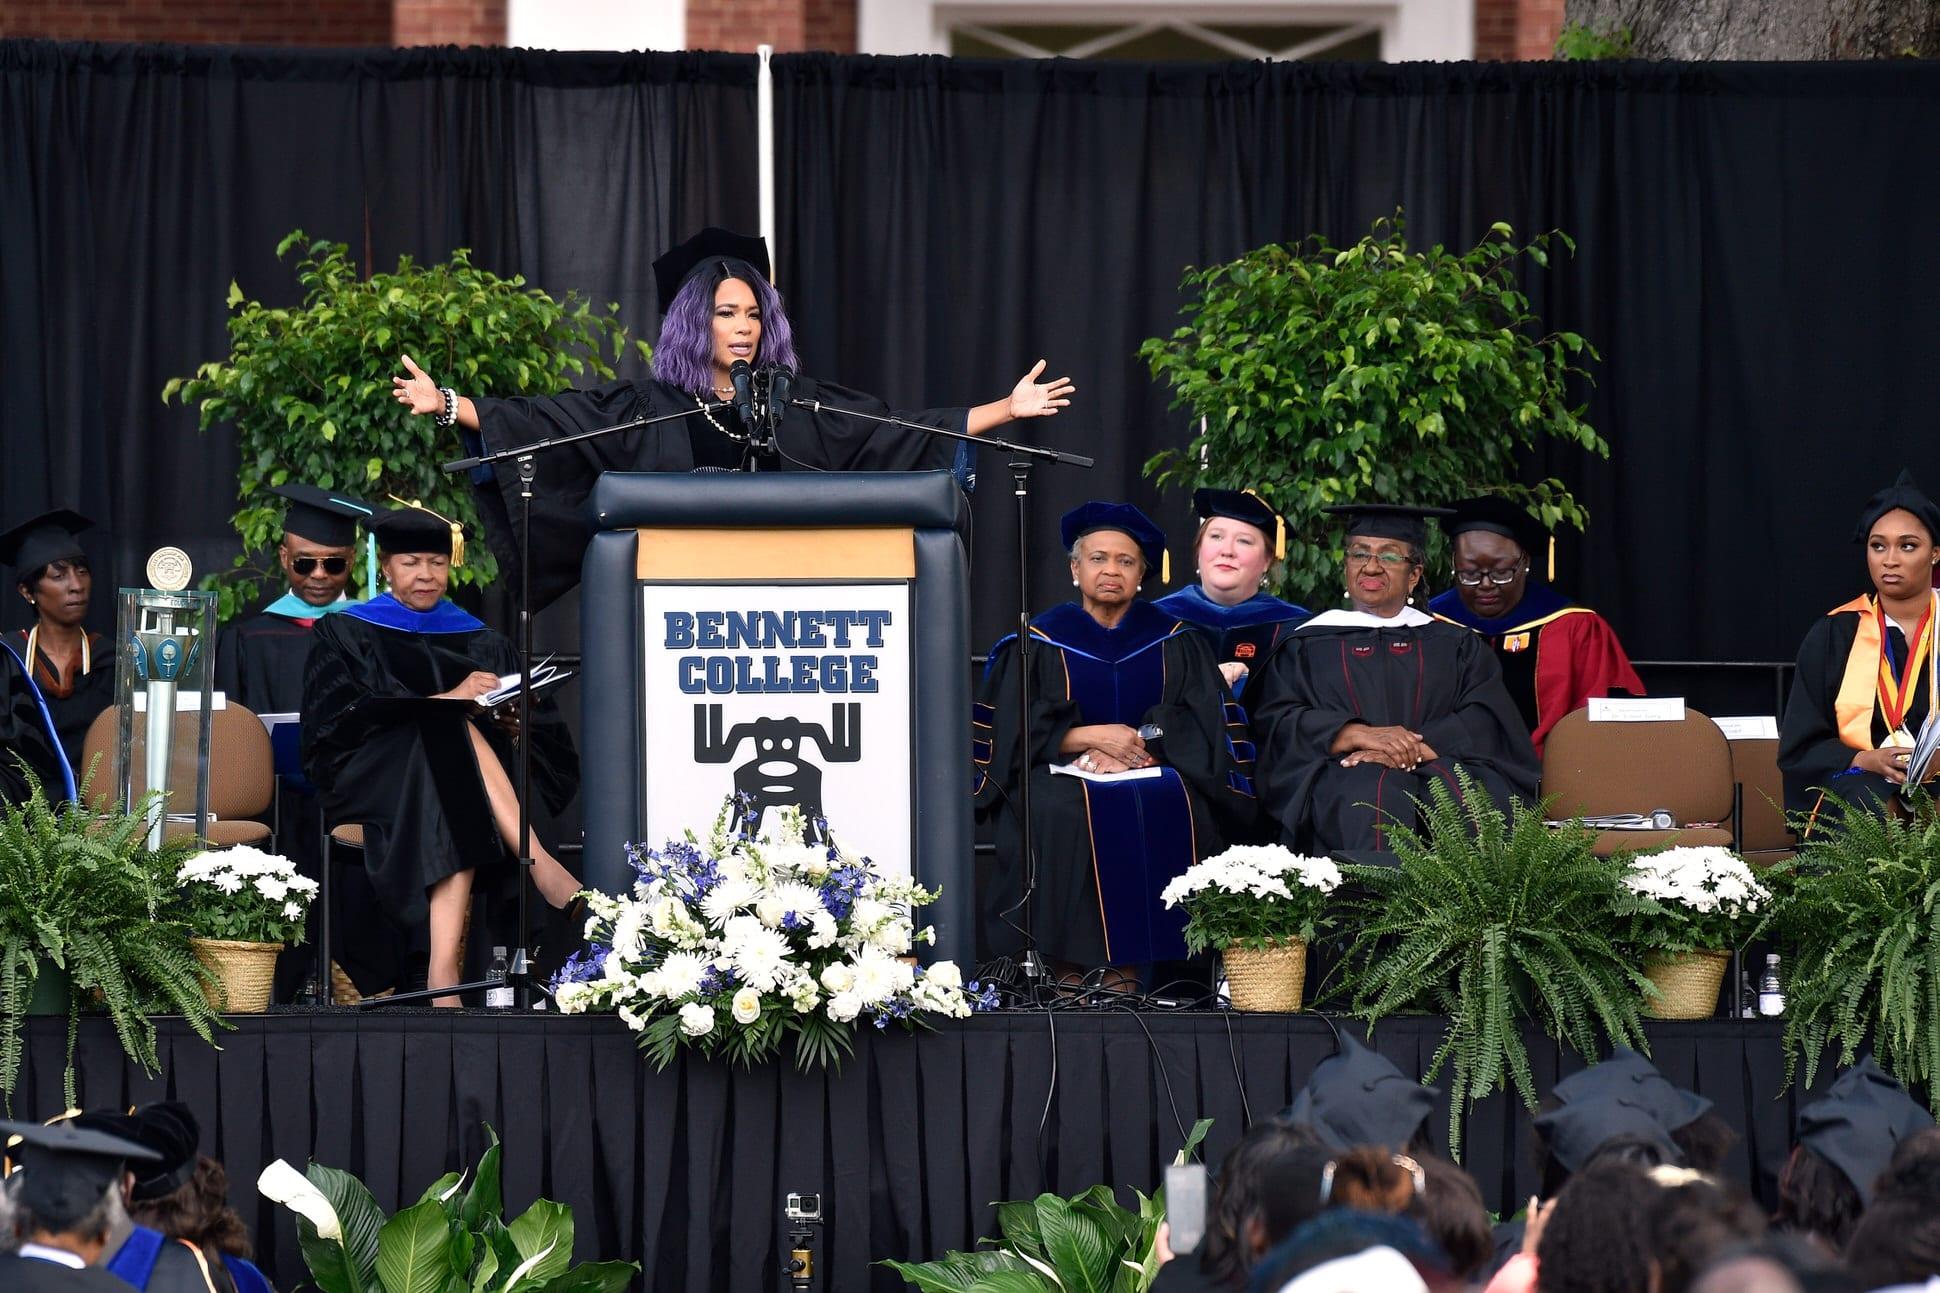 Bennett College, an HBCU for women, ends a long fight for its financial future